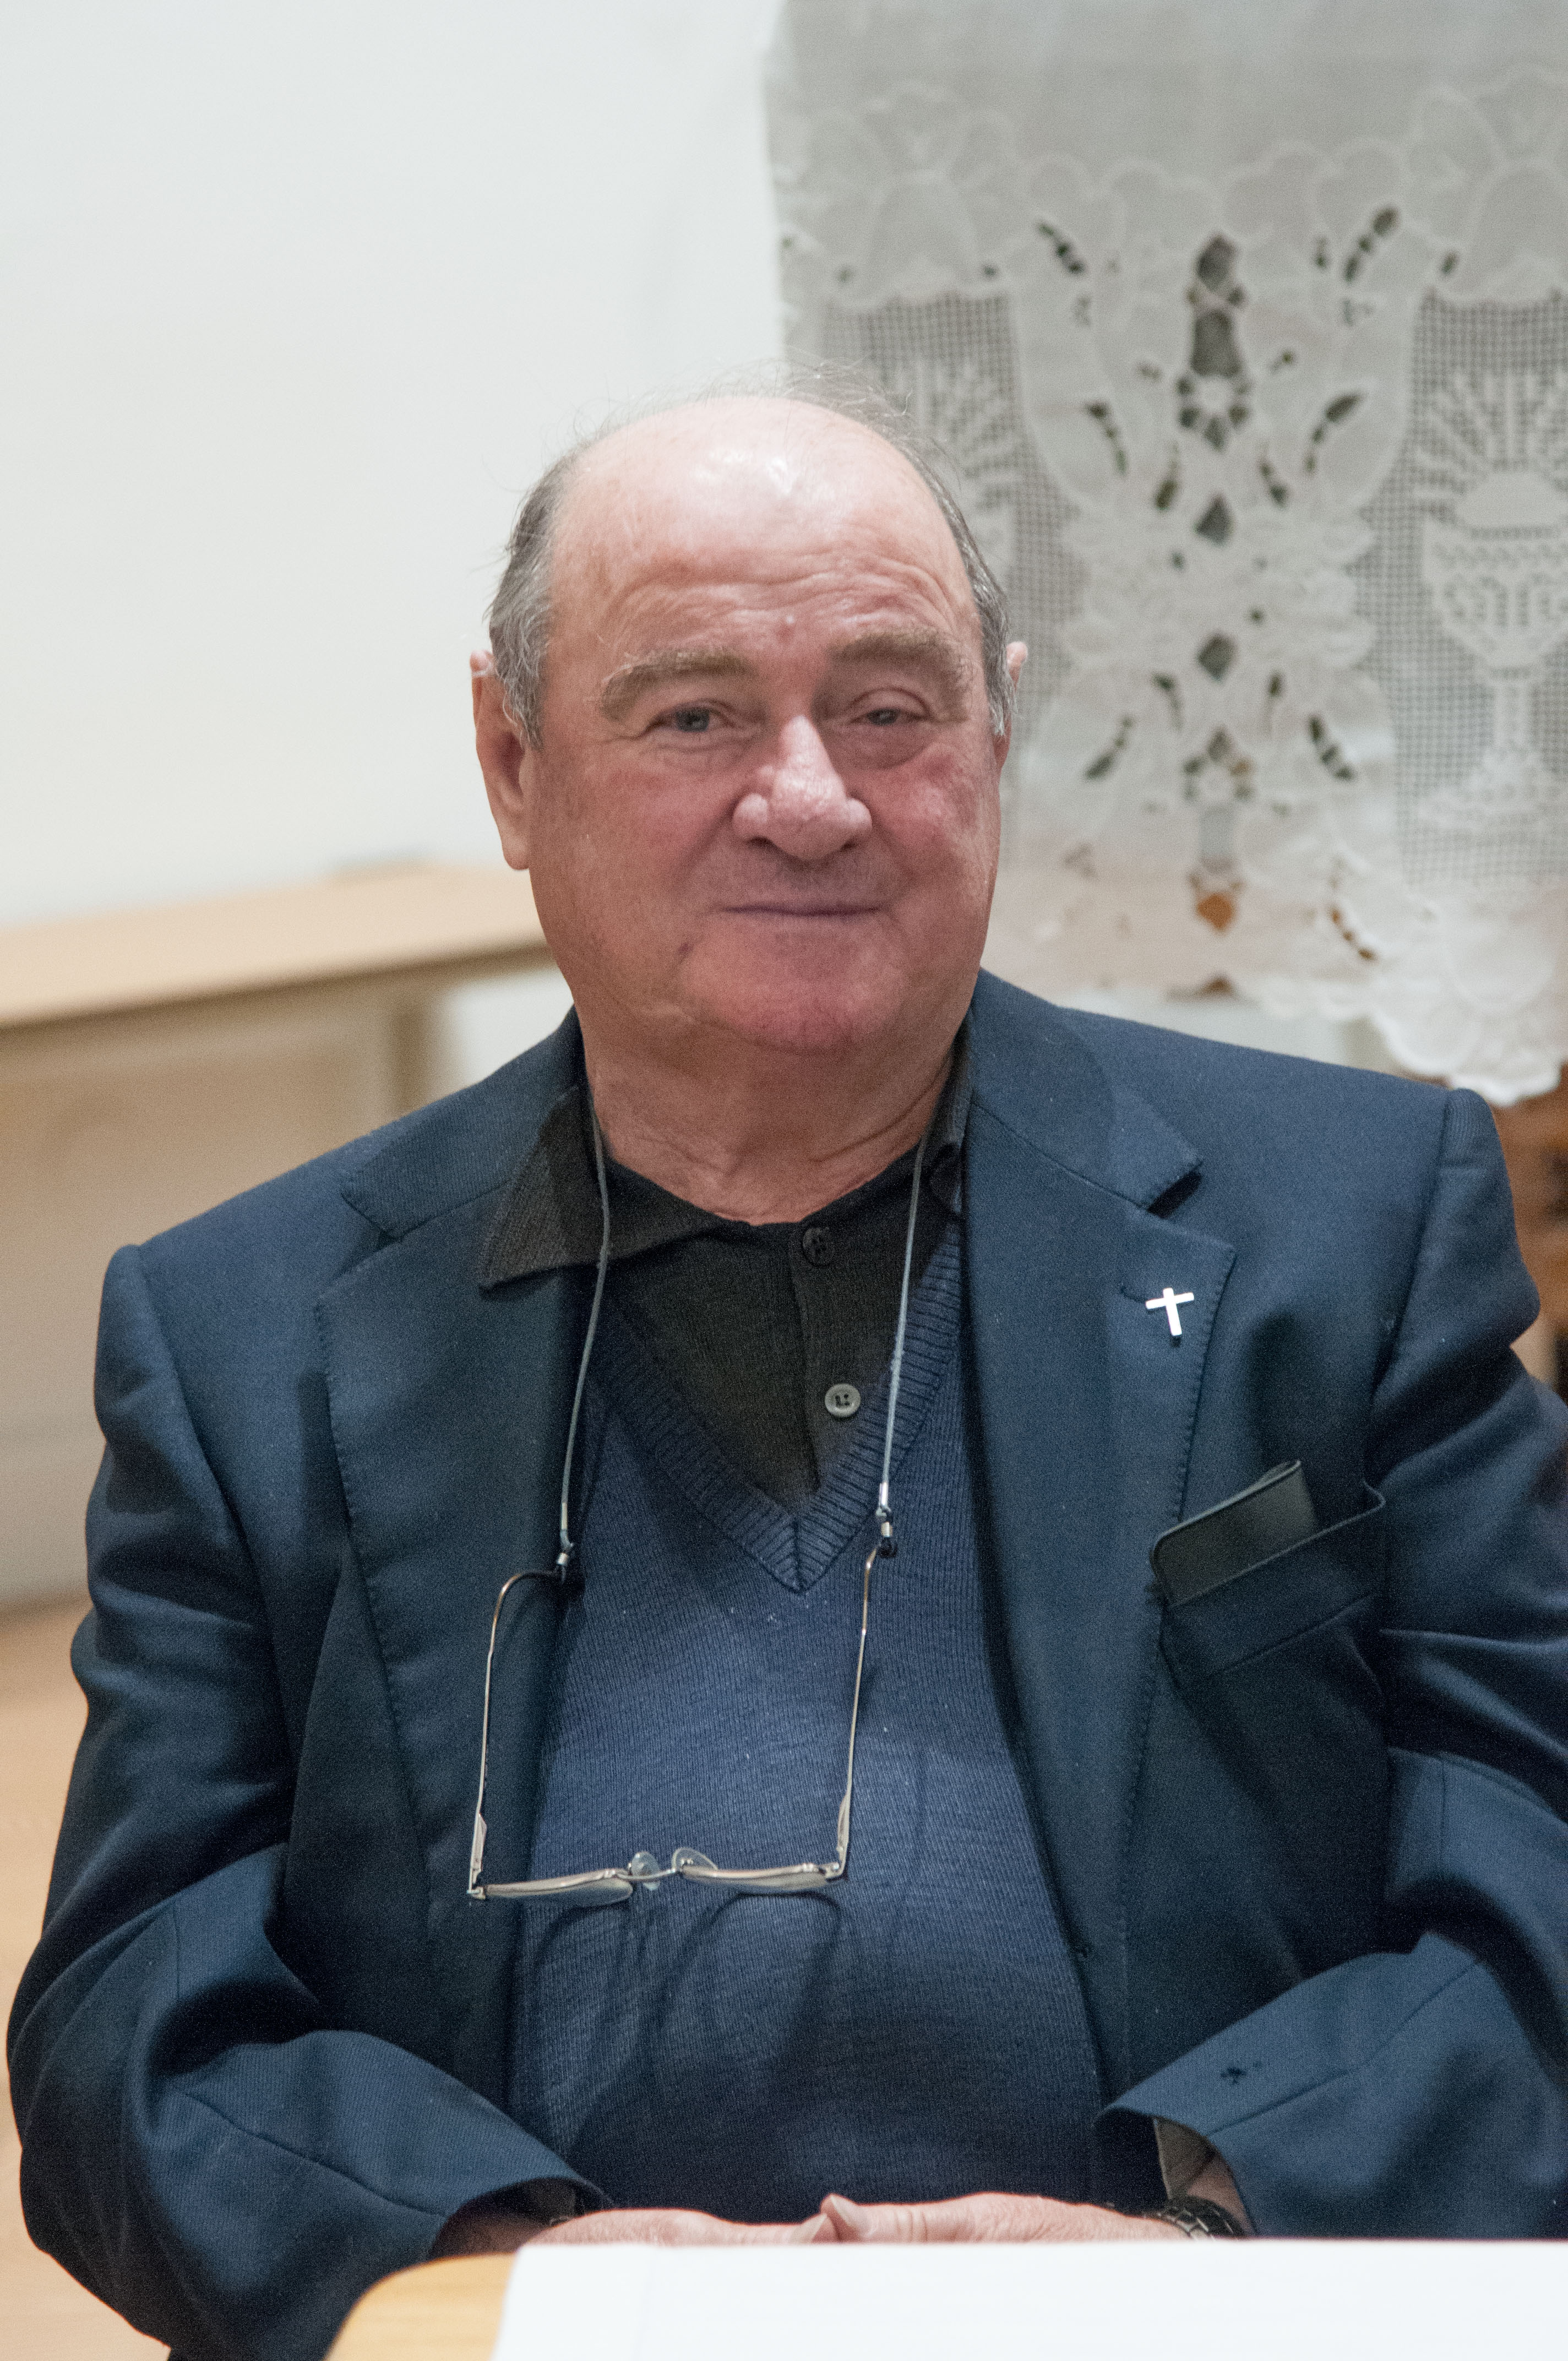 Don Ulderico Palazzi